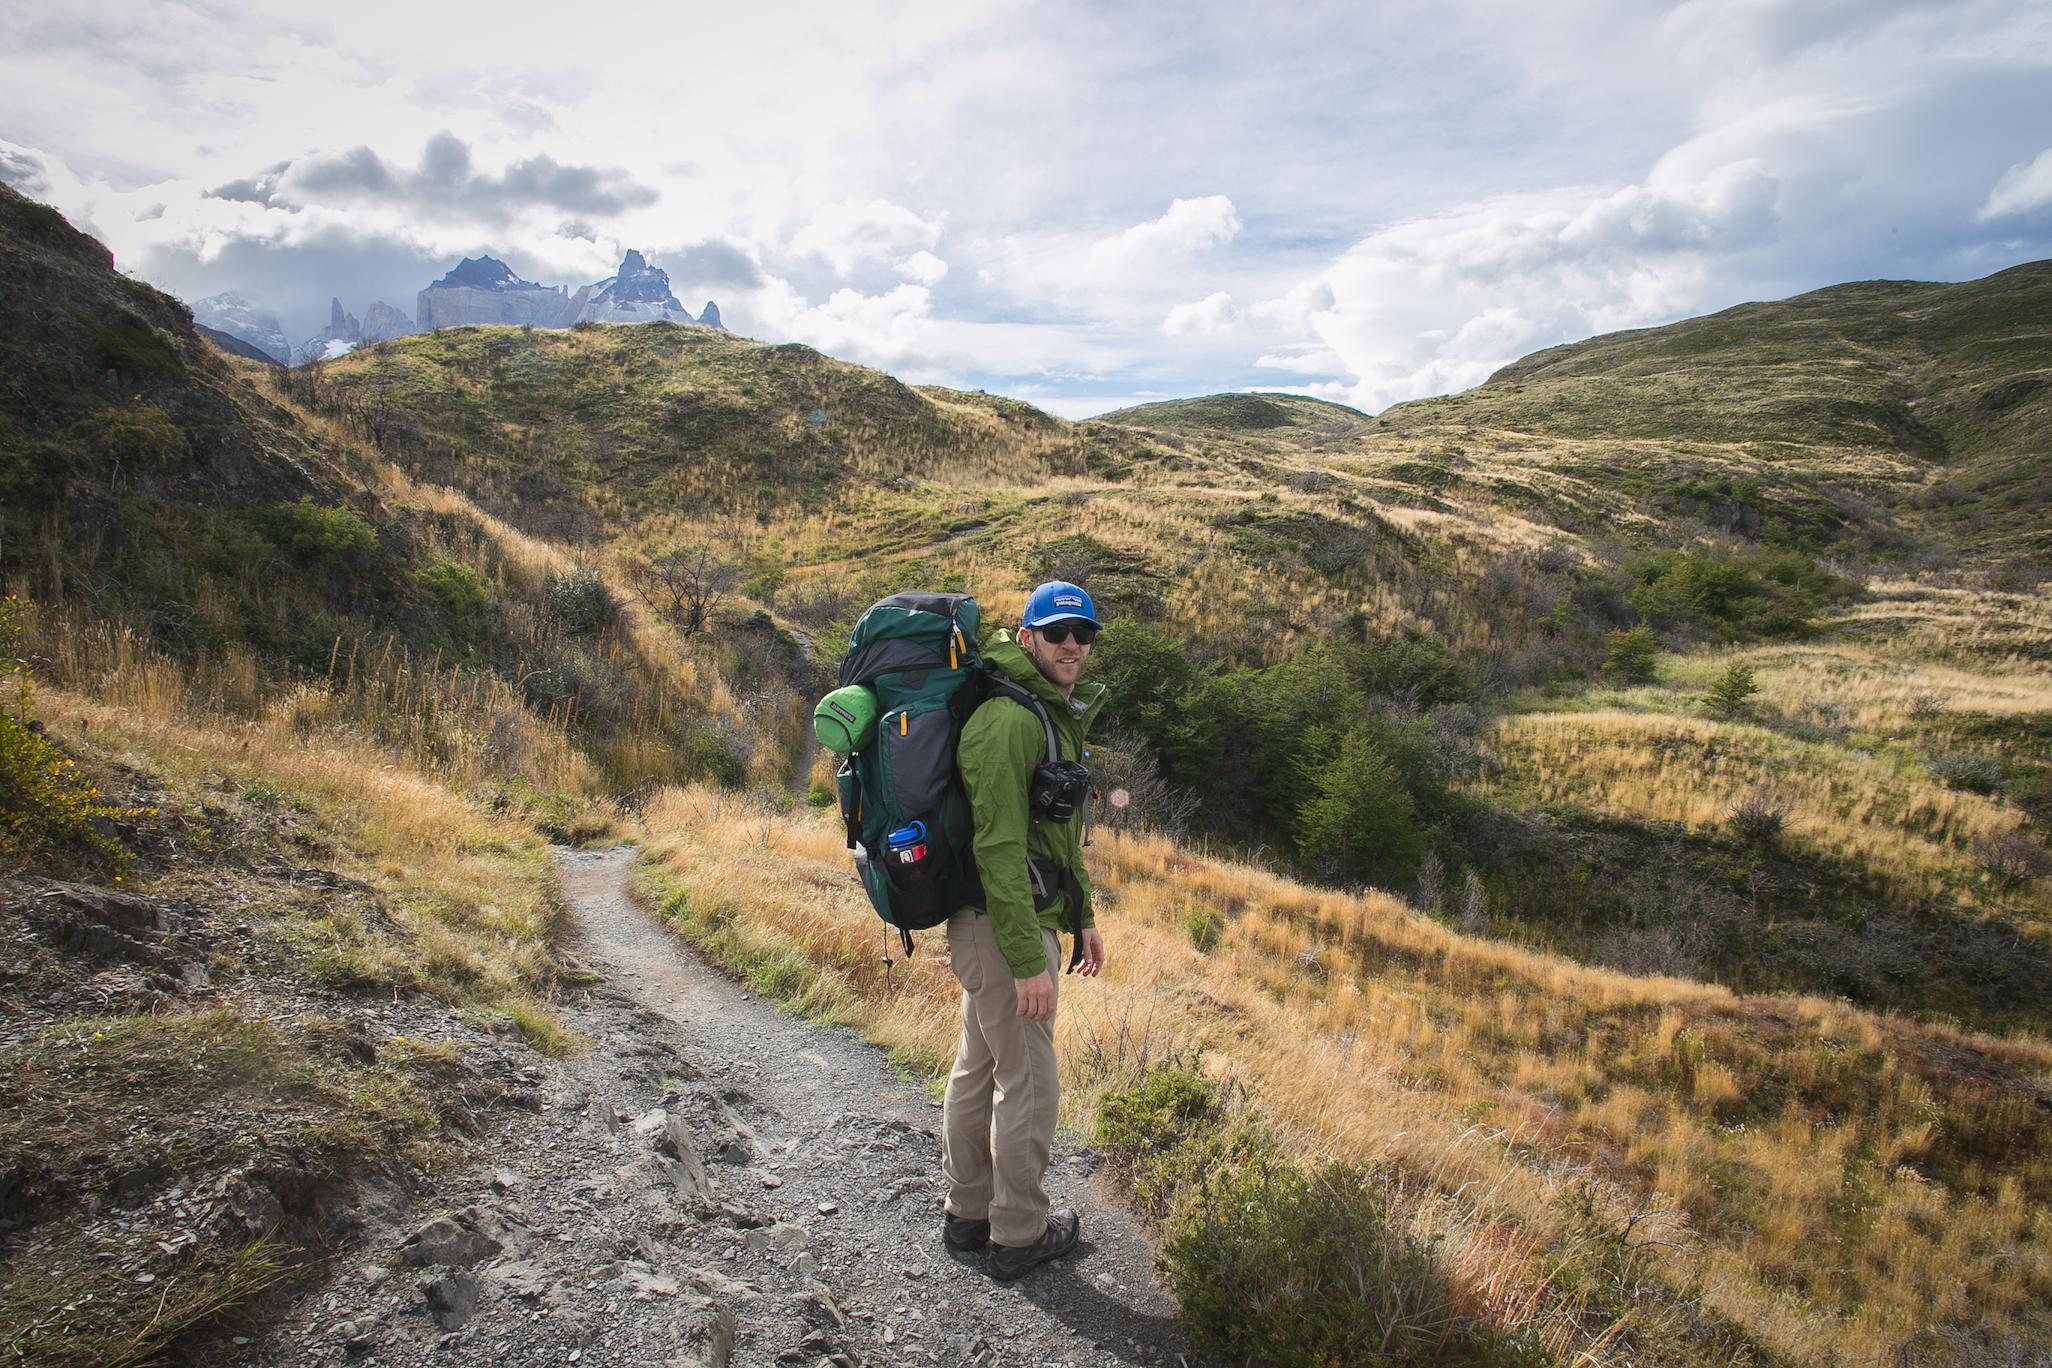 Patagonia2015-46.jpg